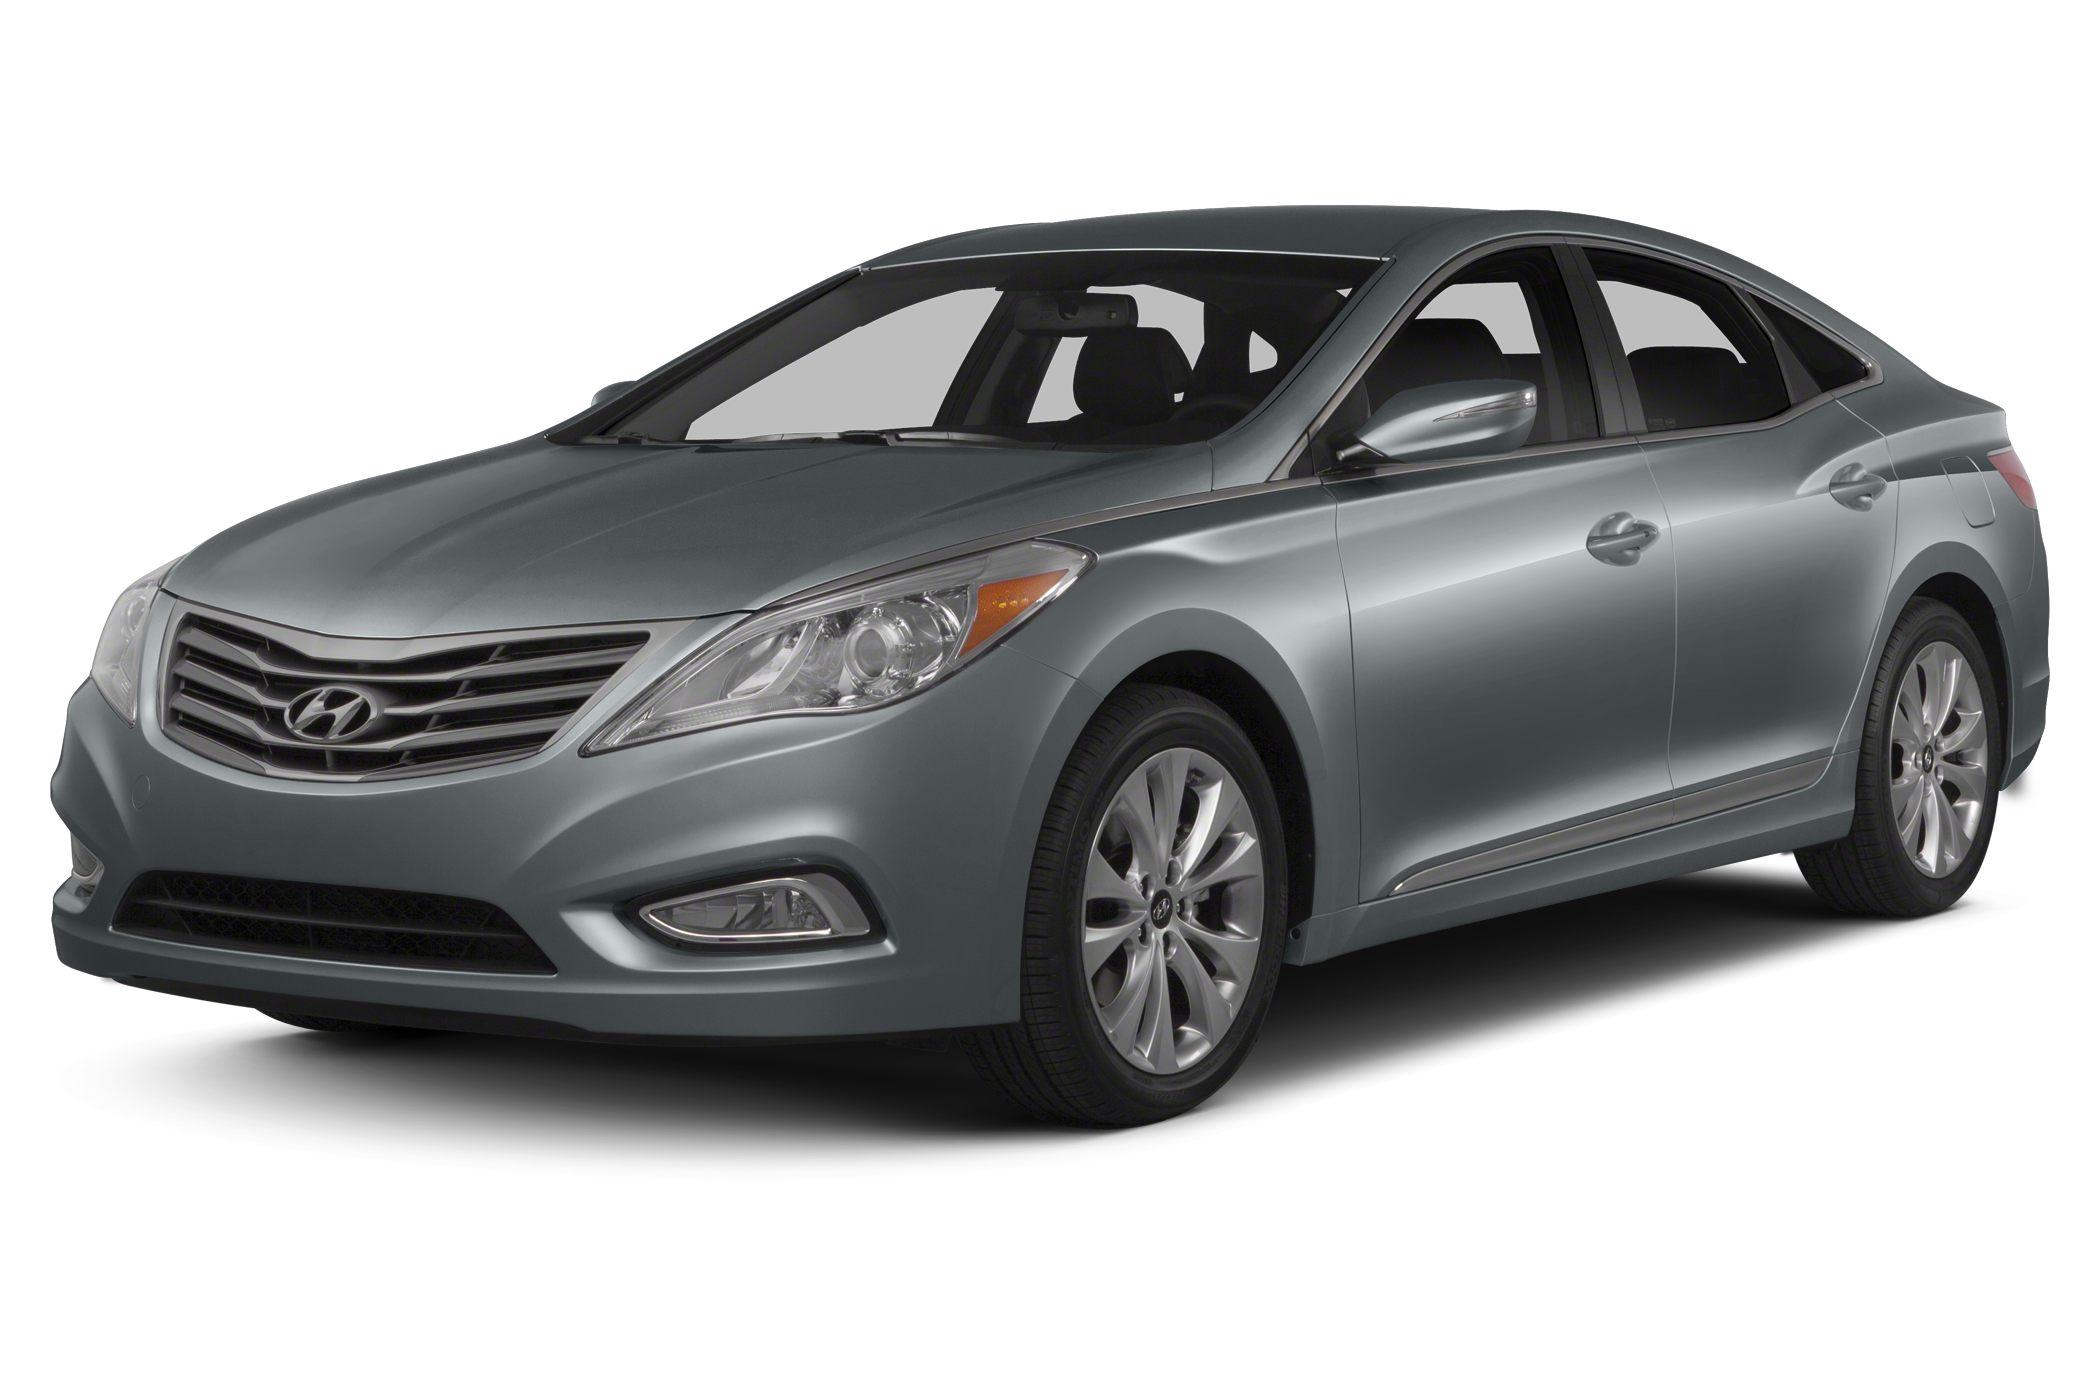 2013 Hyundai Azera Base Sedan for sale in Lake Worth for $19,999 with 27,600 miles.